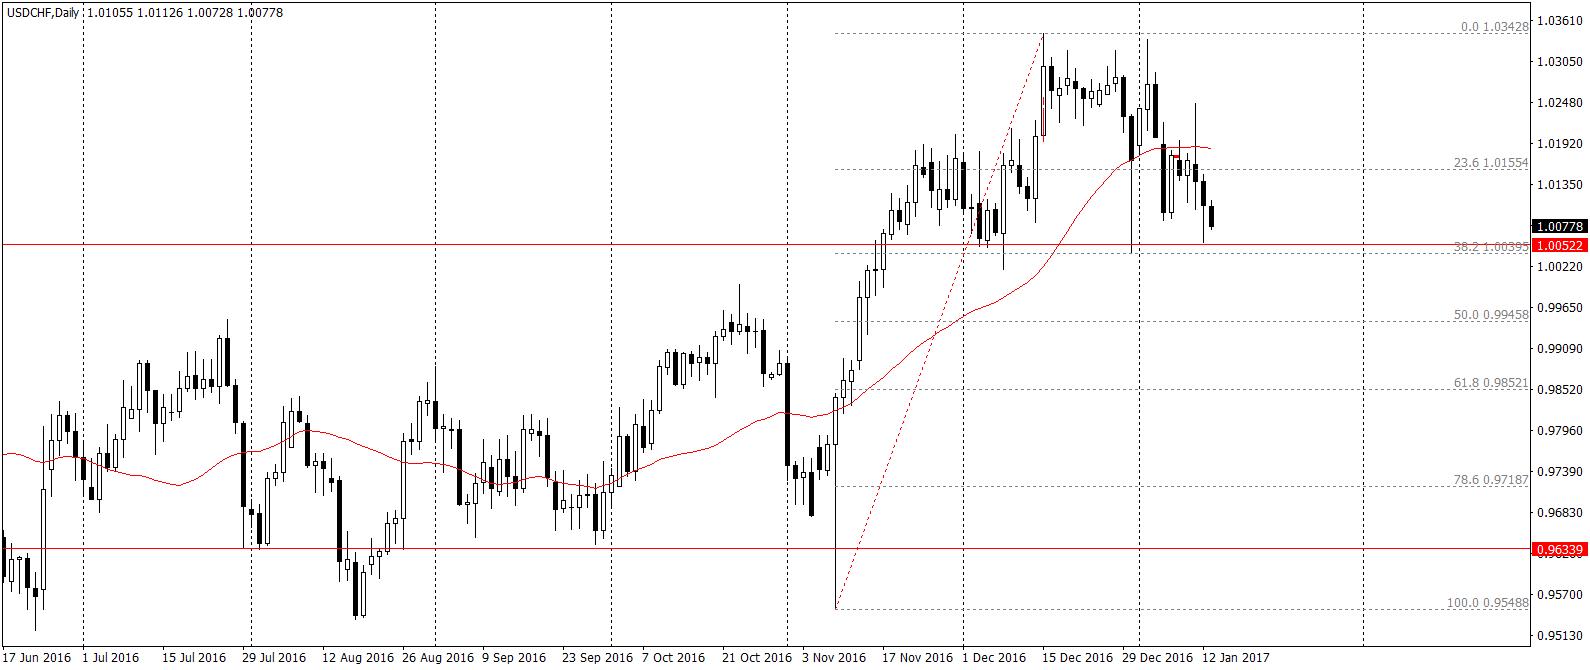 USD/CHF D1